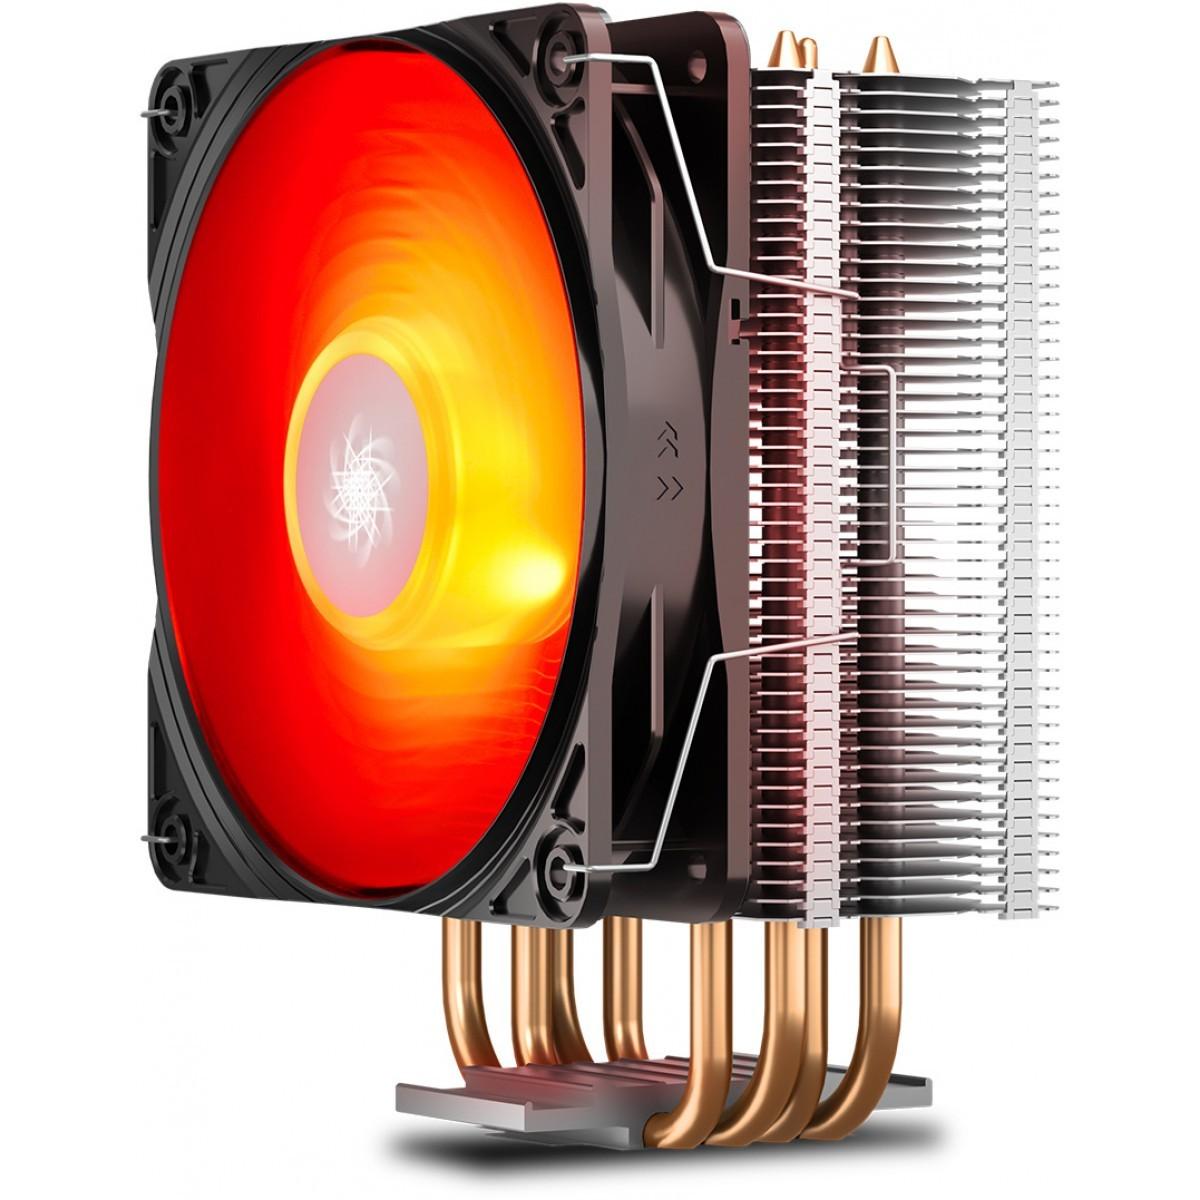 Kit Upgrade Biostar Geforce GT 710 + Ryzen 3 3300x + Biostar A320MH + Memória DDR4 16GB (2x8GB) 3000MHz + Cooler de Brinde